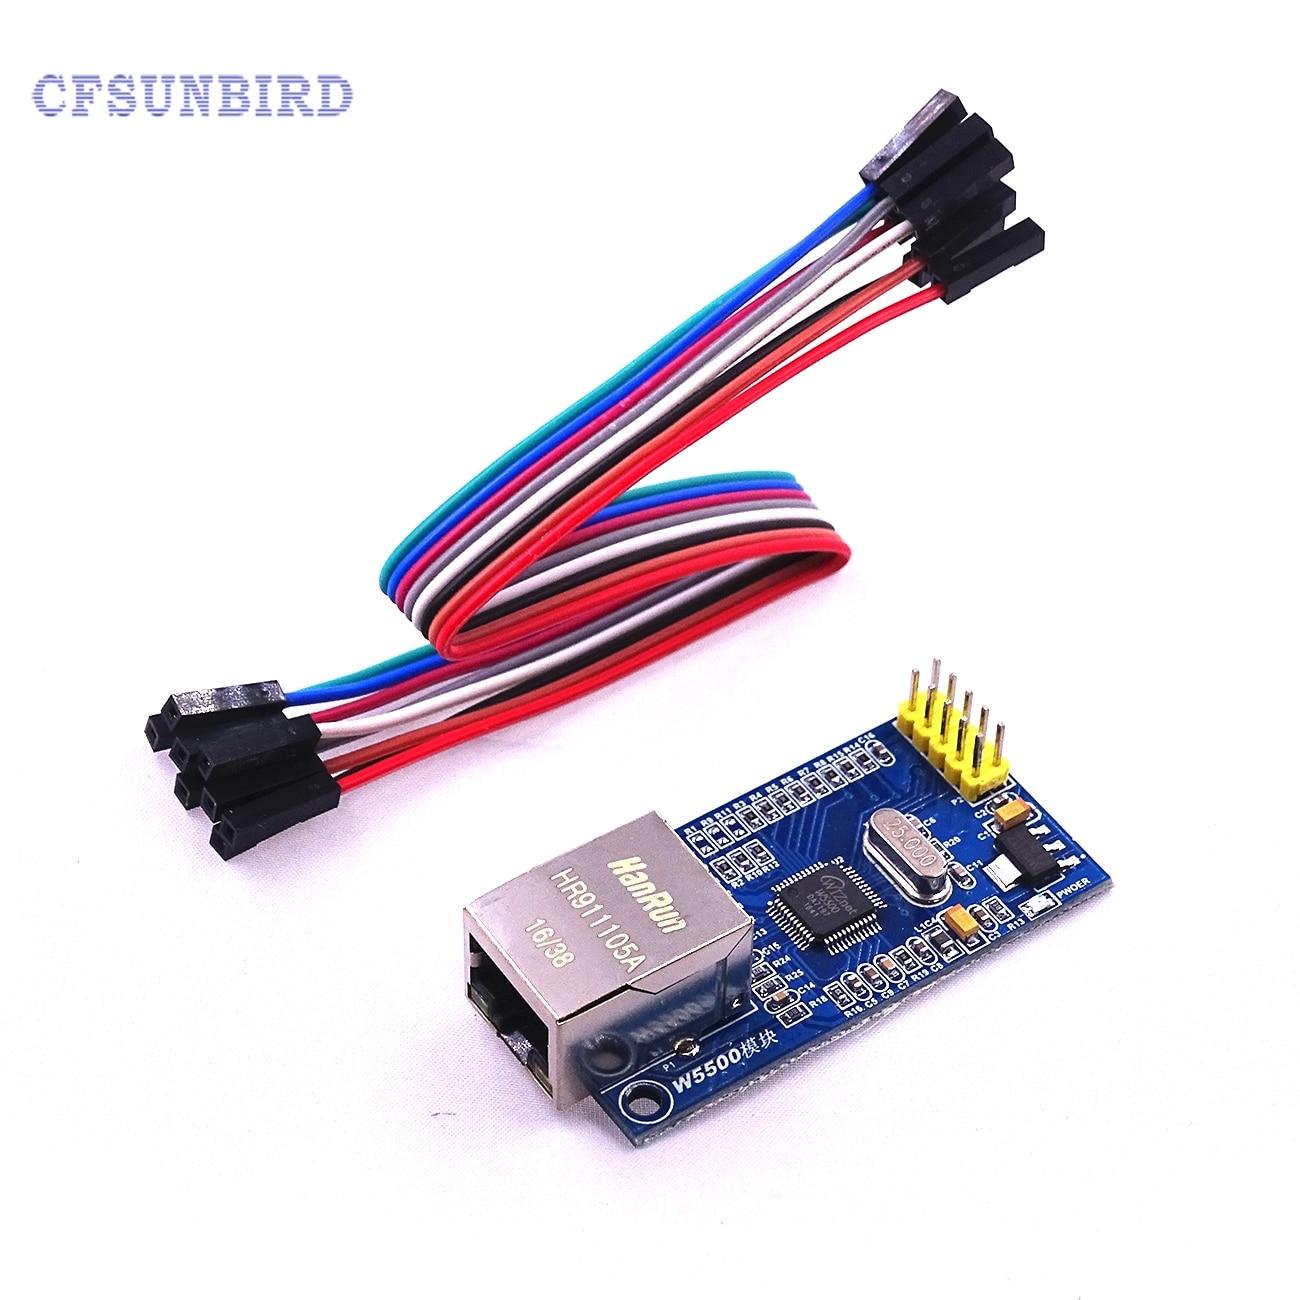 все цены на  1pcs/lot W5500 Ethernet network module hardware TCP / IP 51 / STM32 microcontroller program over W5100  онлайн